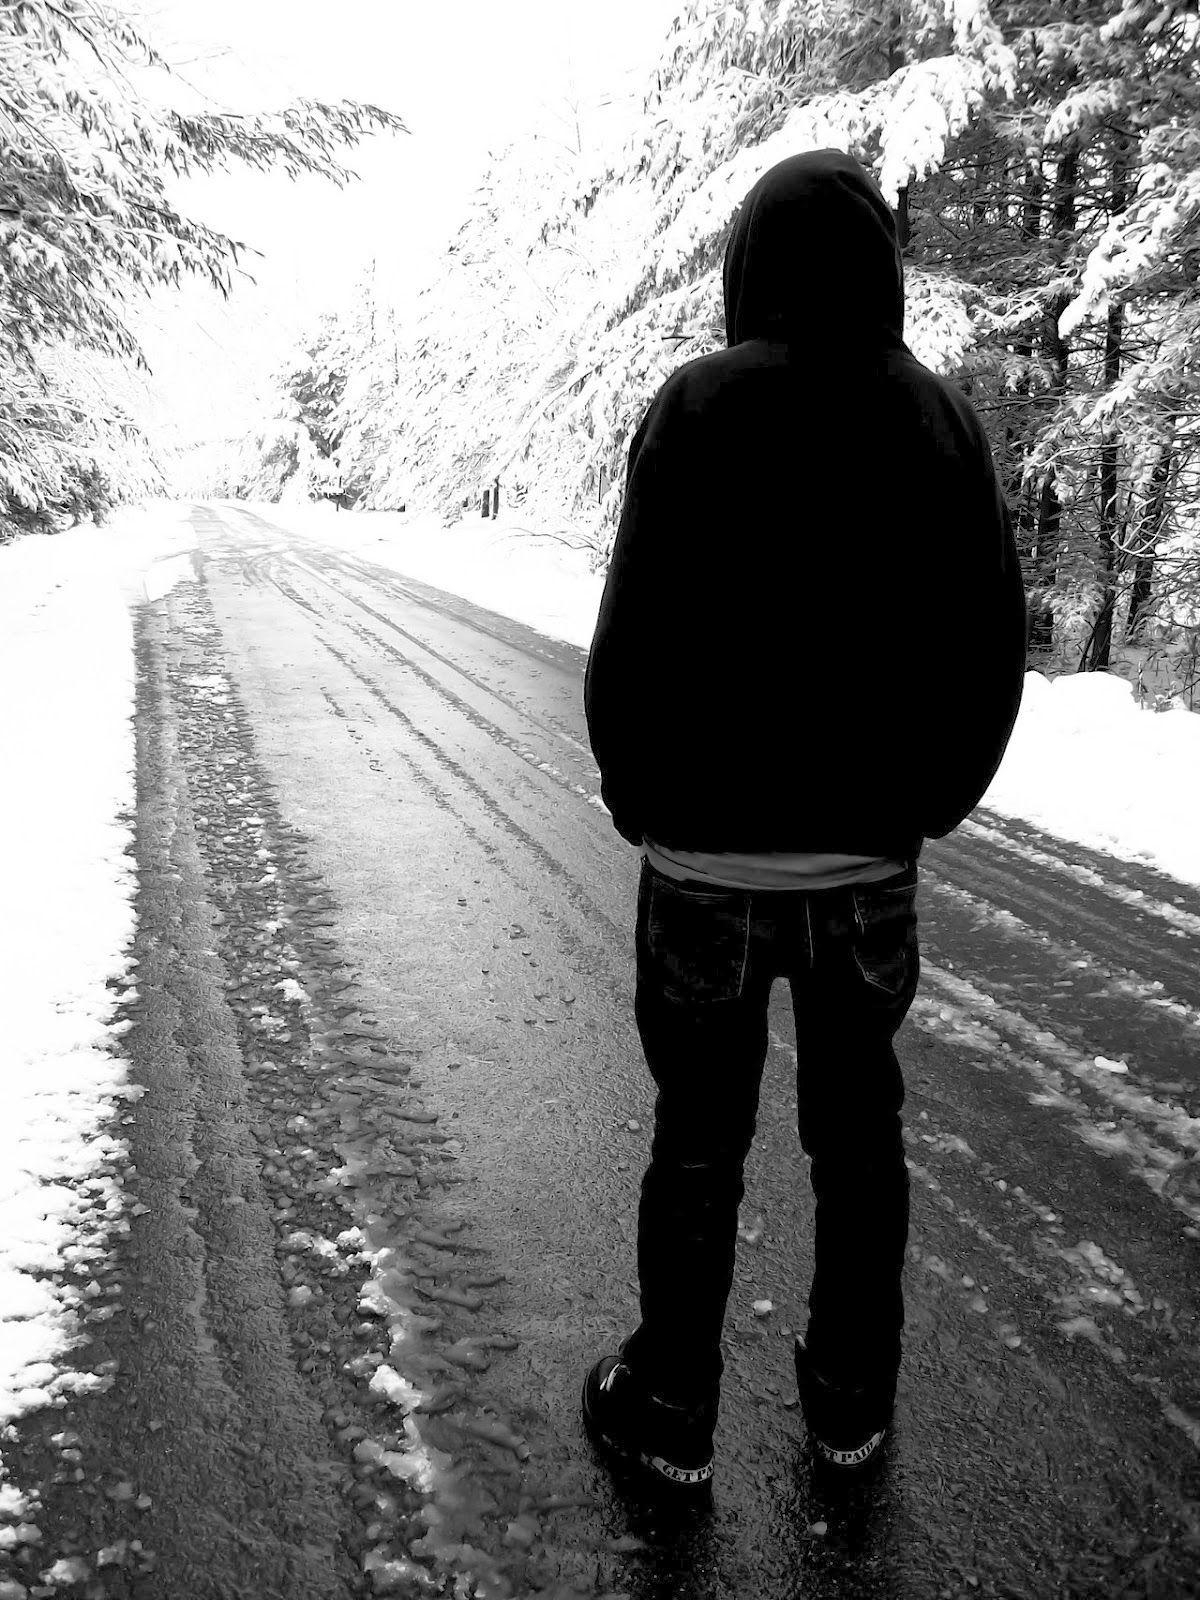 Missing Beats Of Life Alone Boy Hd Wallpaper And Images Boys Wallpaper Alone Boy Wallpaper Broken Heart Wallpaper